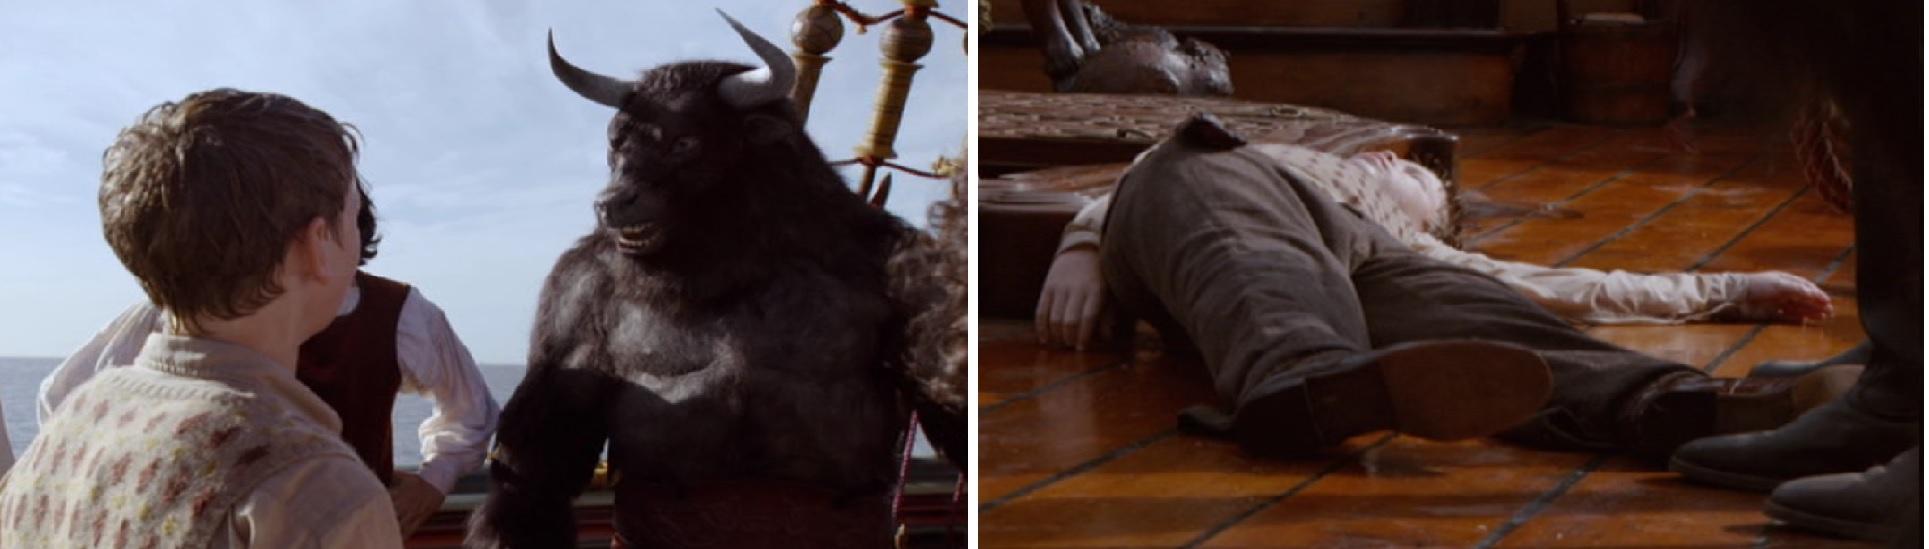 Weta Narnia General Otmin Statue :: Profile :: Dark Horse Comics